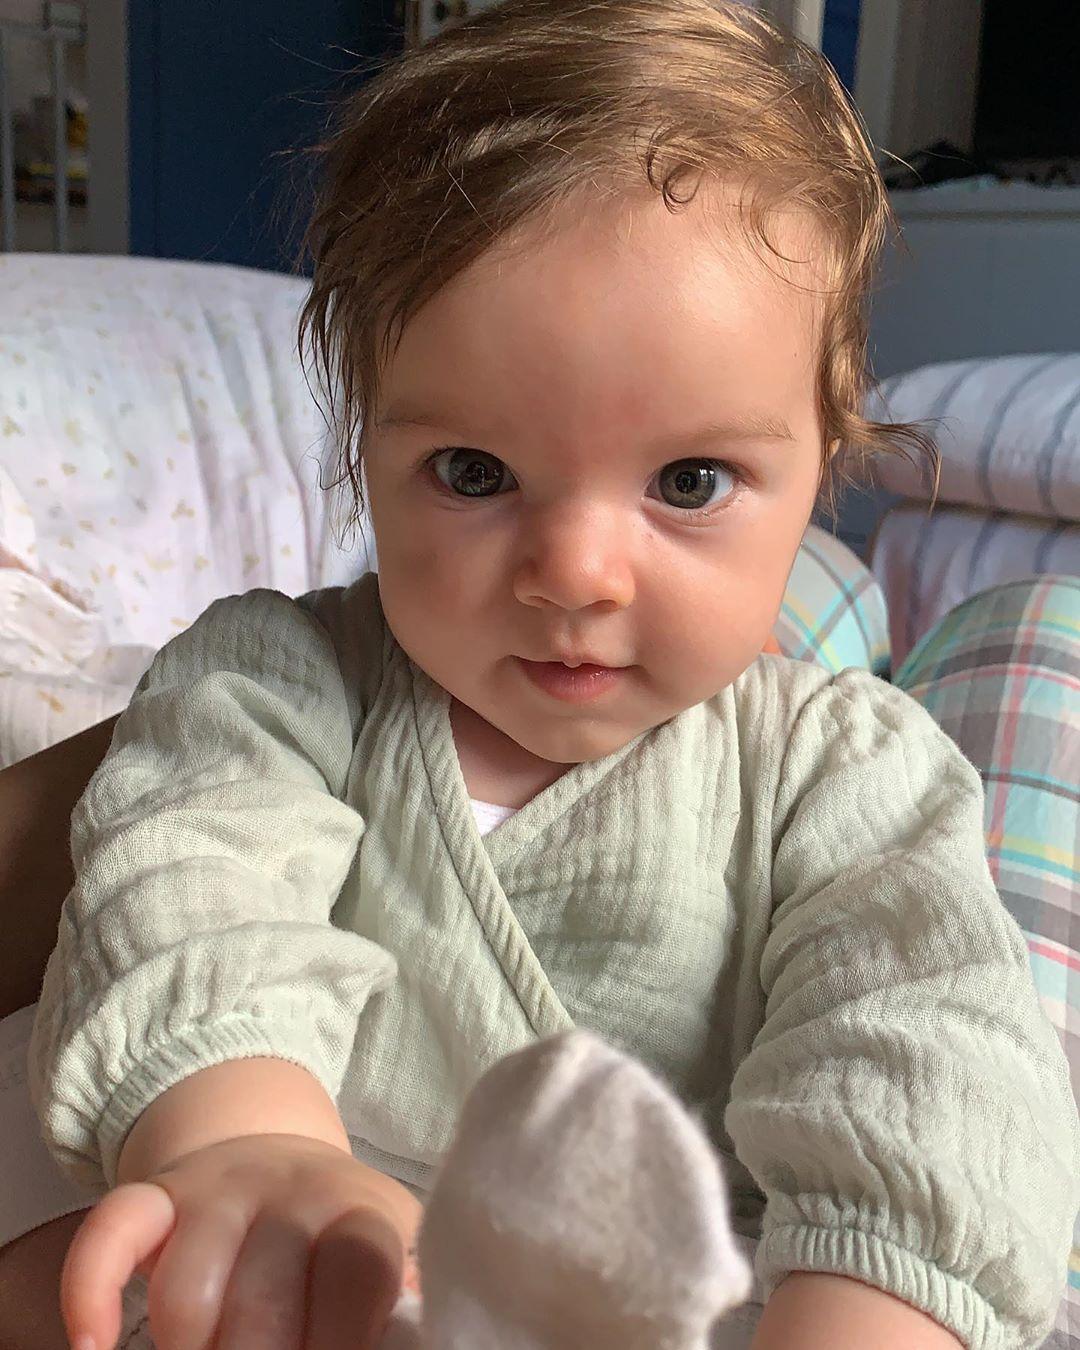 Maria, filha de Laura Neiva e Chay Suede